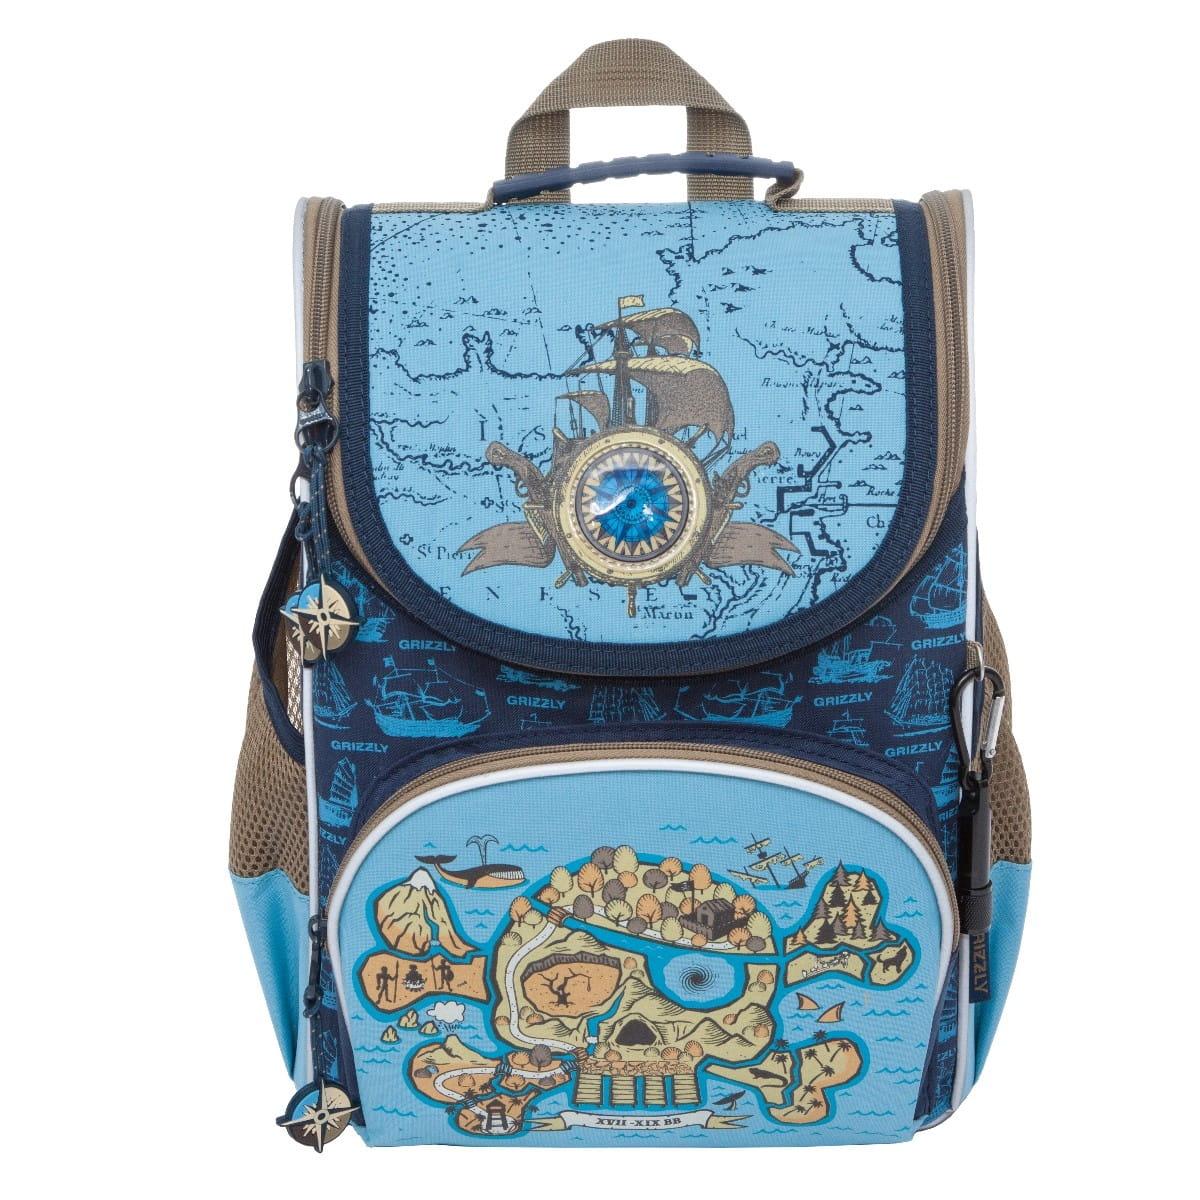 Рюкзак GRIZZLY Череп  сине-голубой (с мешком для обуви) - Рюкзаки и ранцы